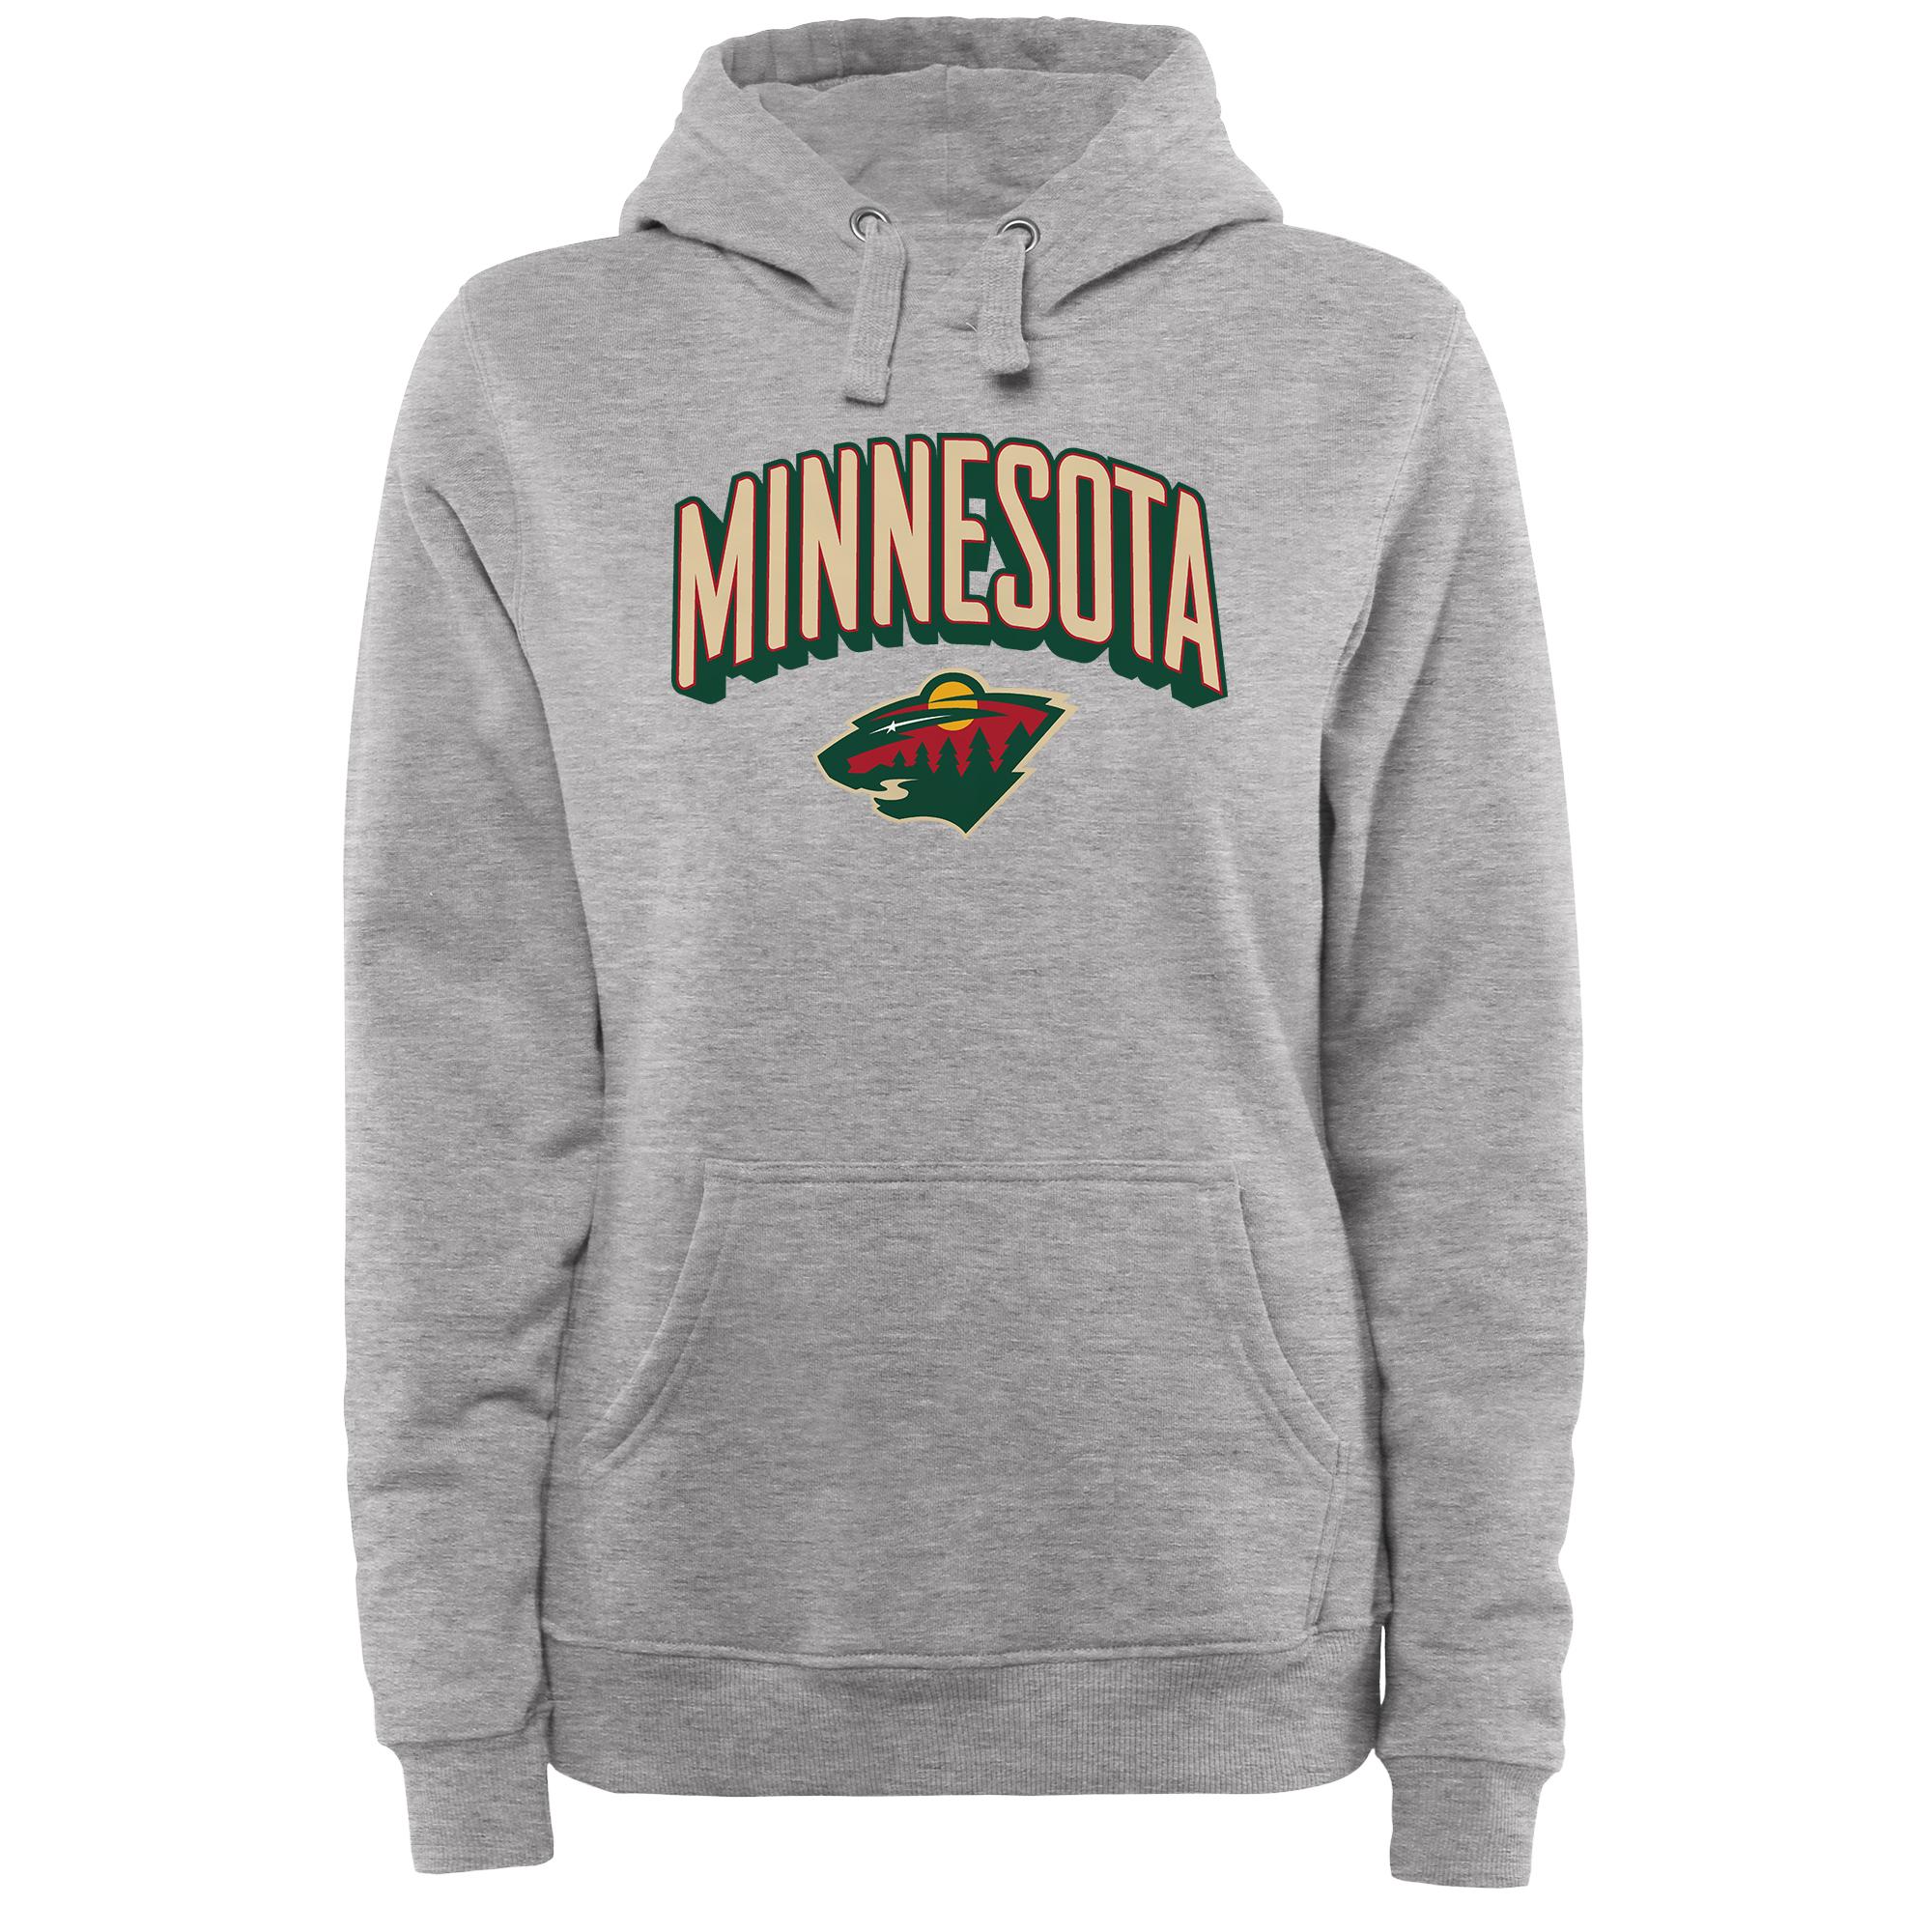 Minnesota Wild Women's ThreeDee Pullover Hoodie - Ash